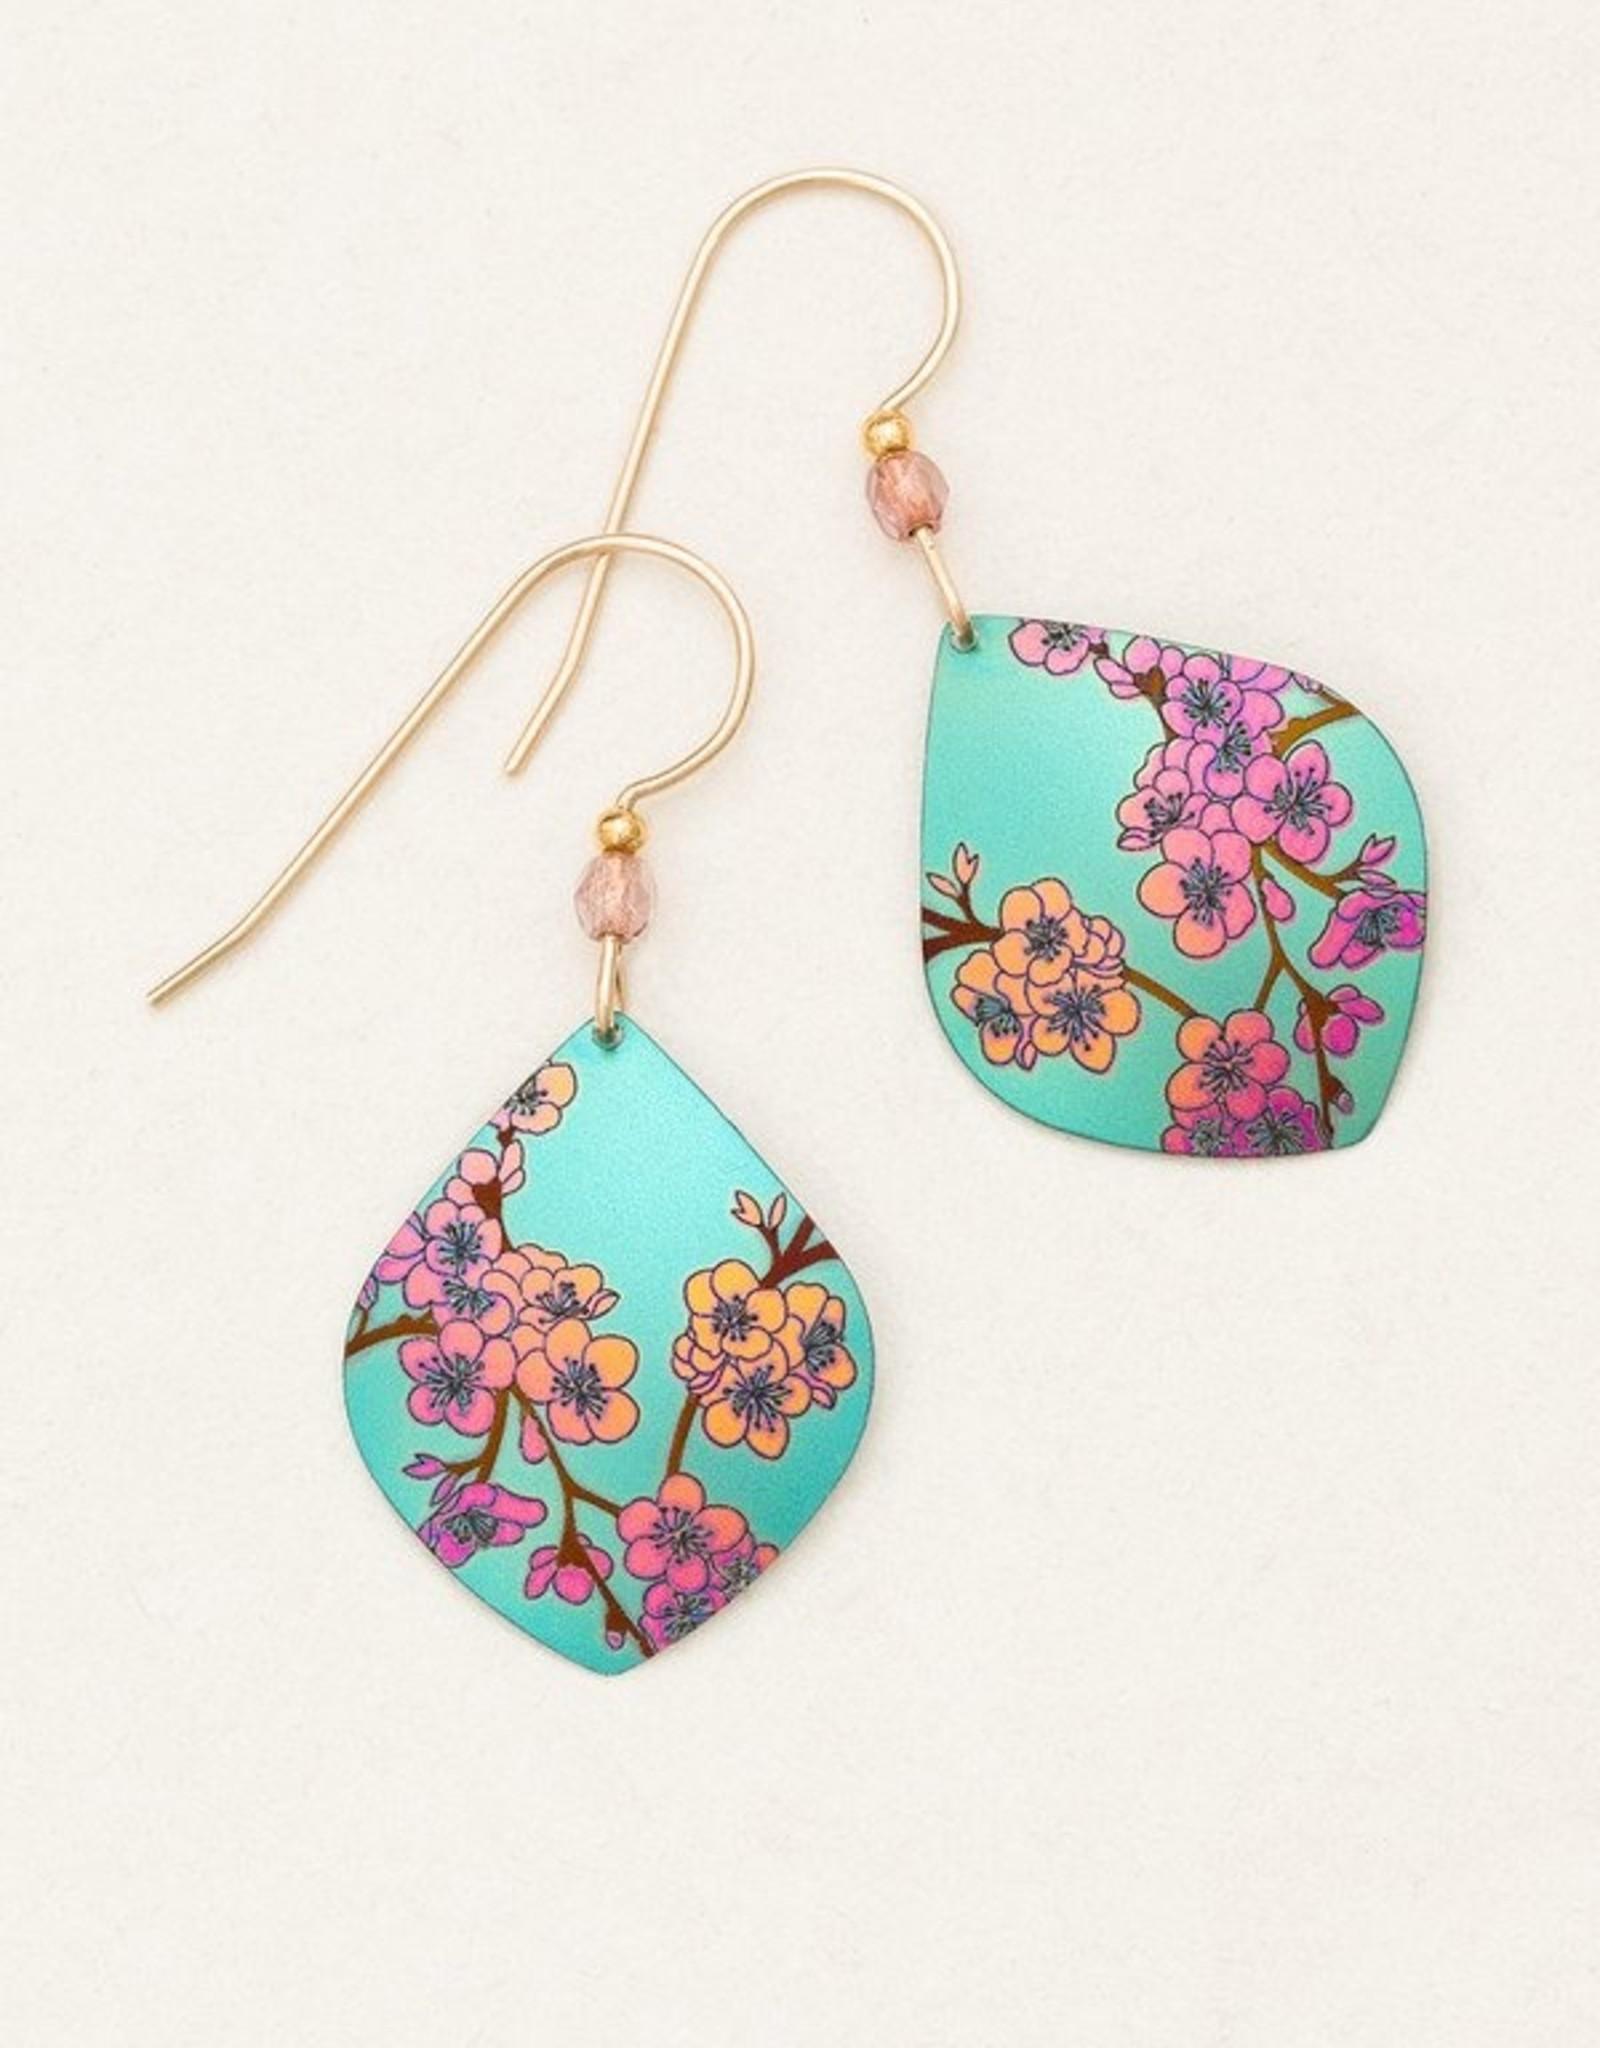 Holly Yashi Teal Spring in Bloom Earrings